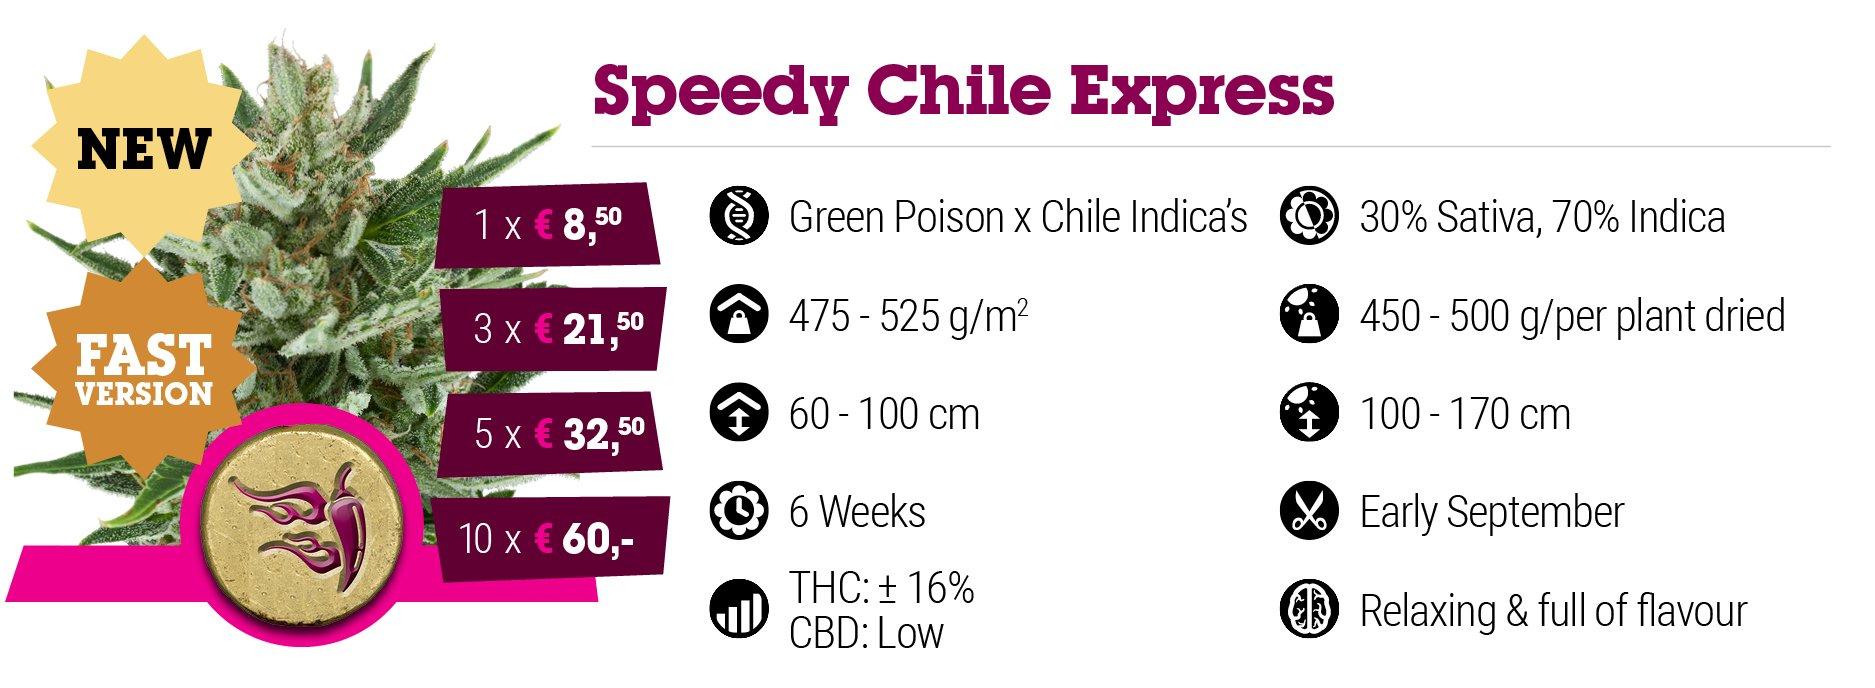 Speedy Chile